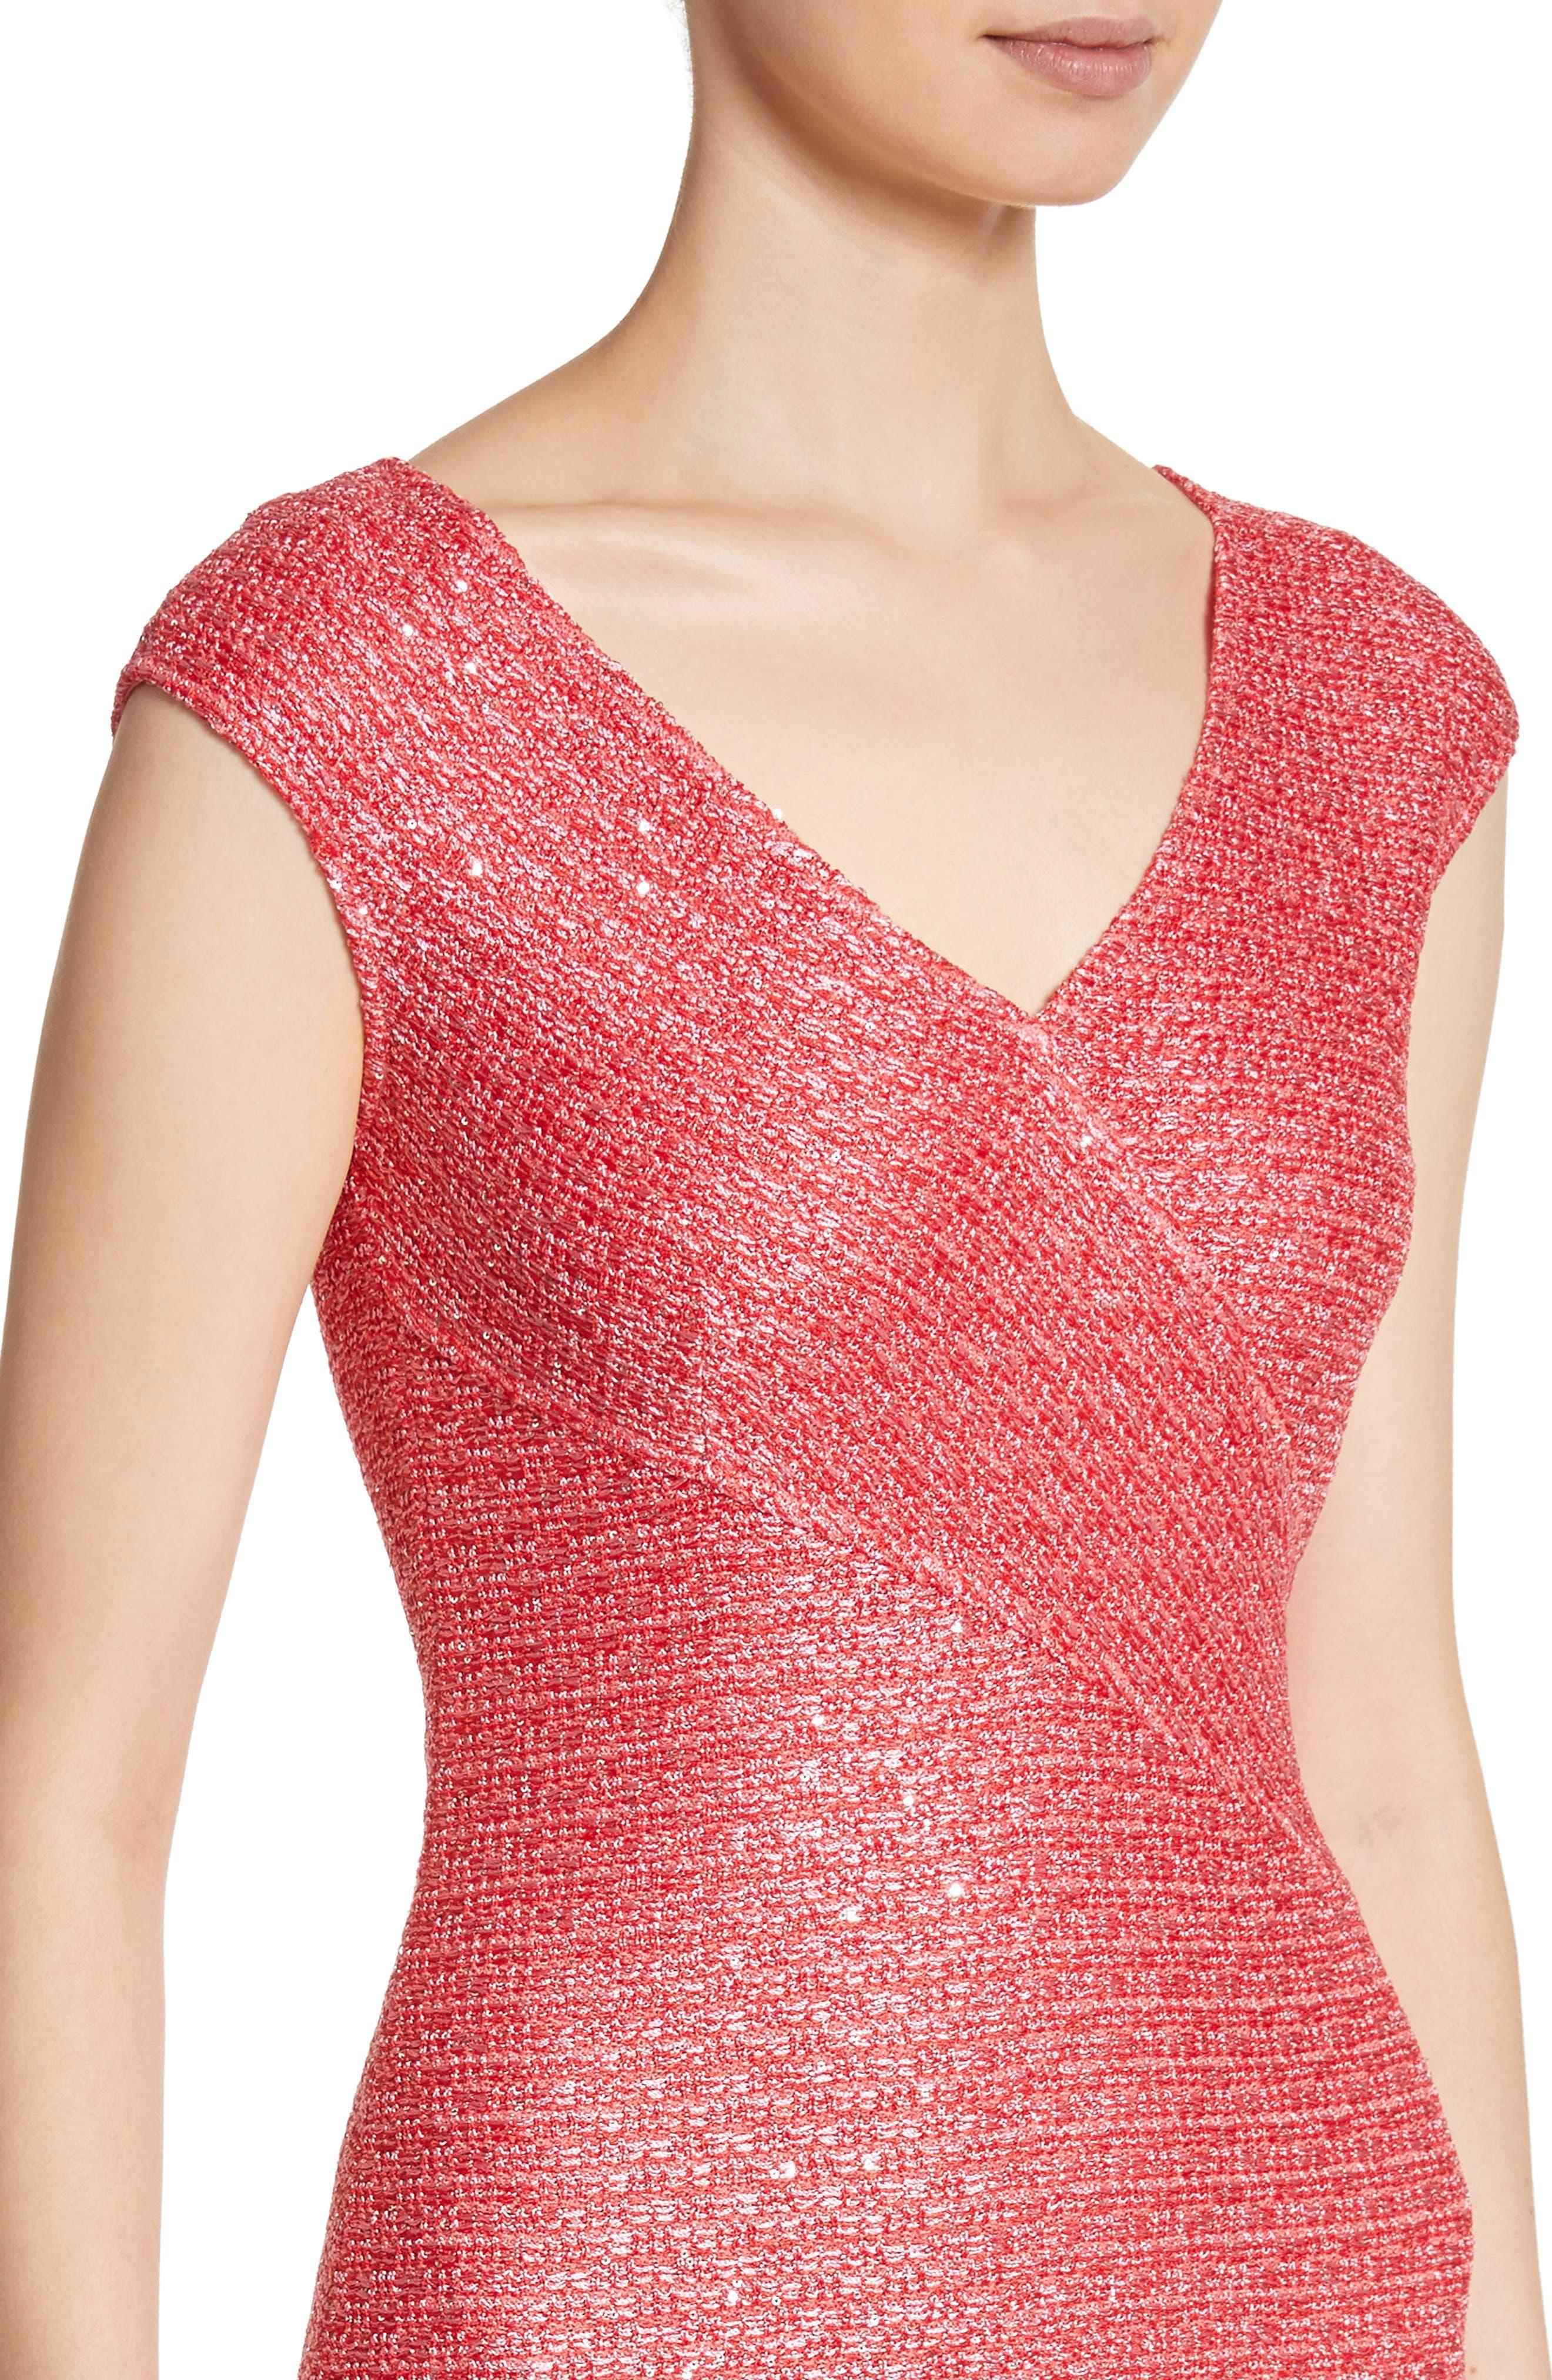 ST. JOHN COLLECTION,                             Hansh Knit Dress,                             Alternate thumbnail 4, color,                             950